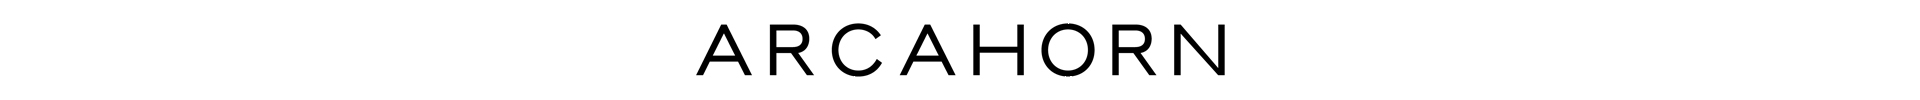 ARCAHORN_Logo_Indoor_Möbel_&_Accessoires